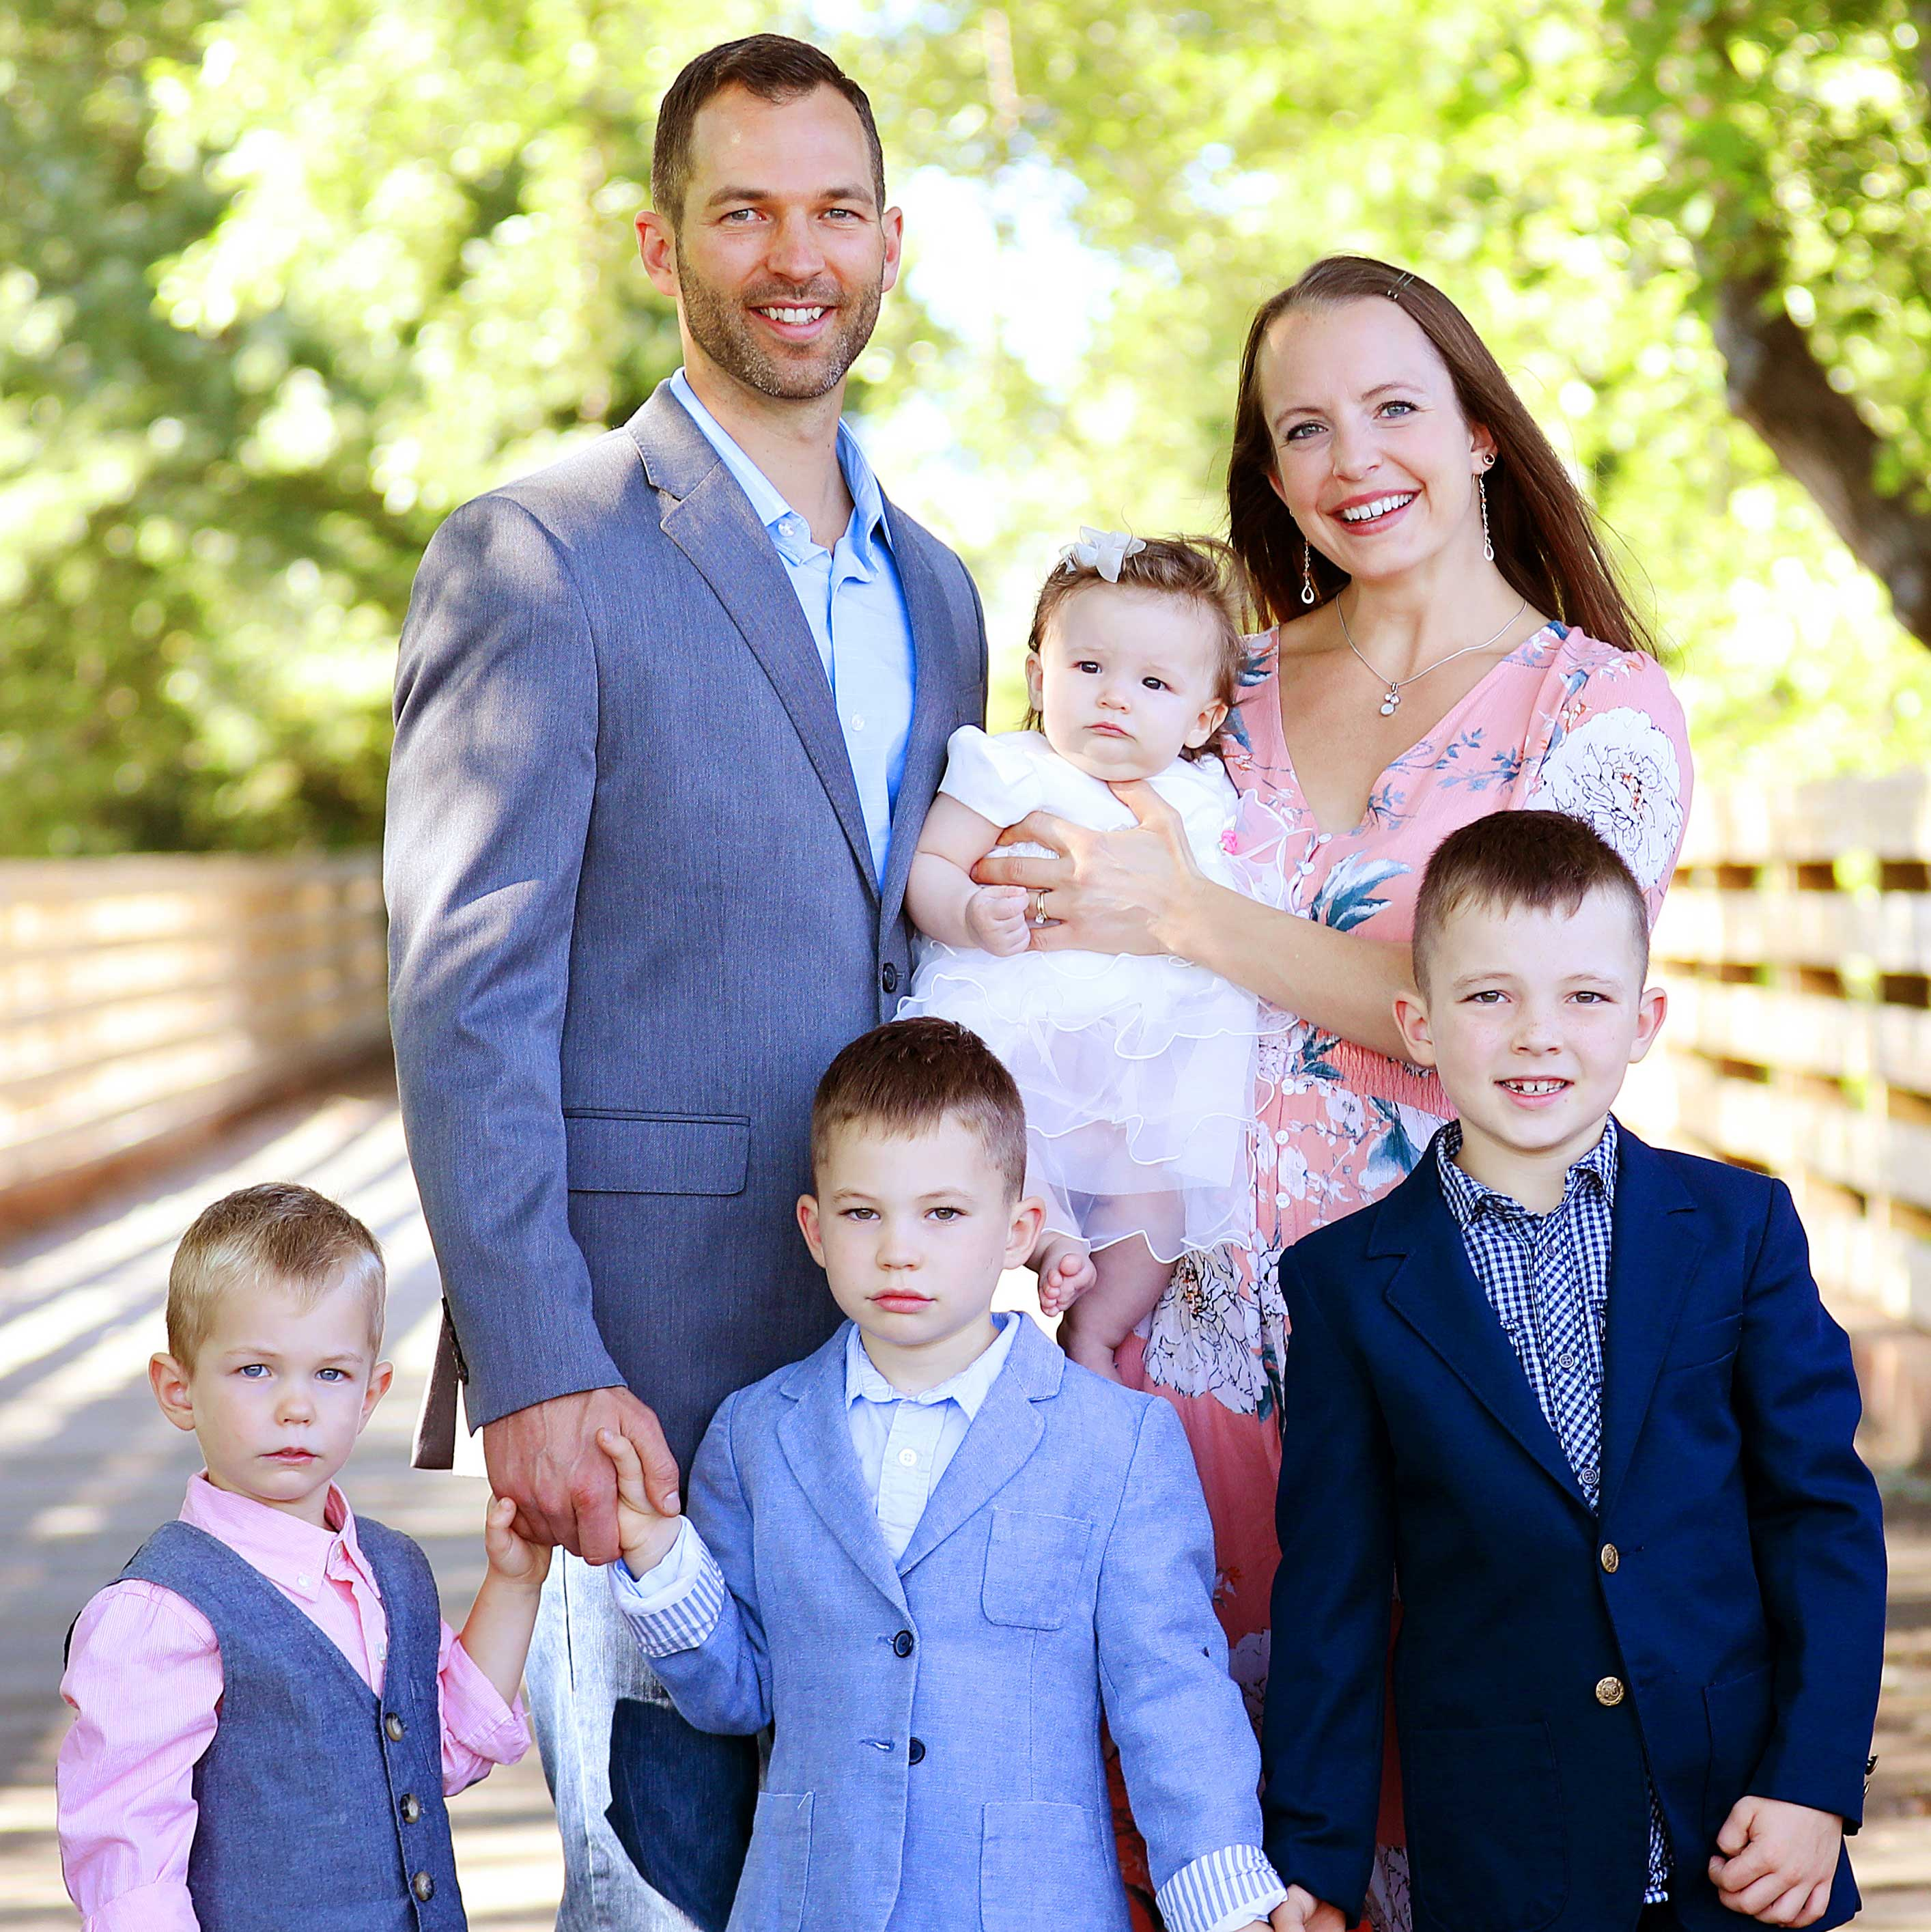 Lukasek family